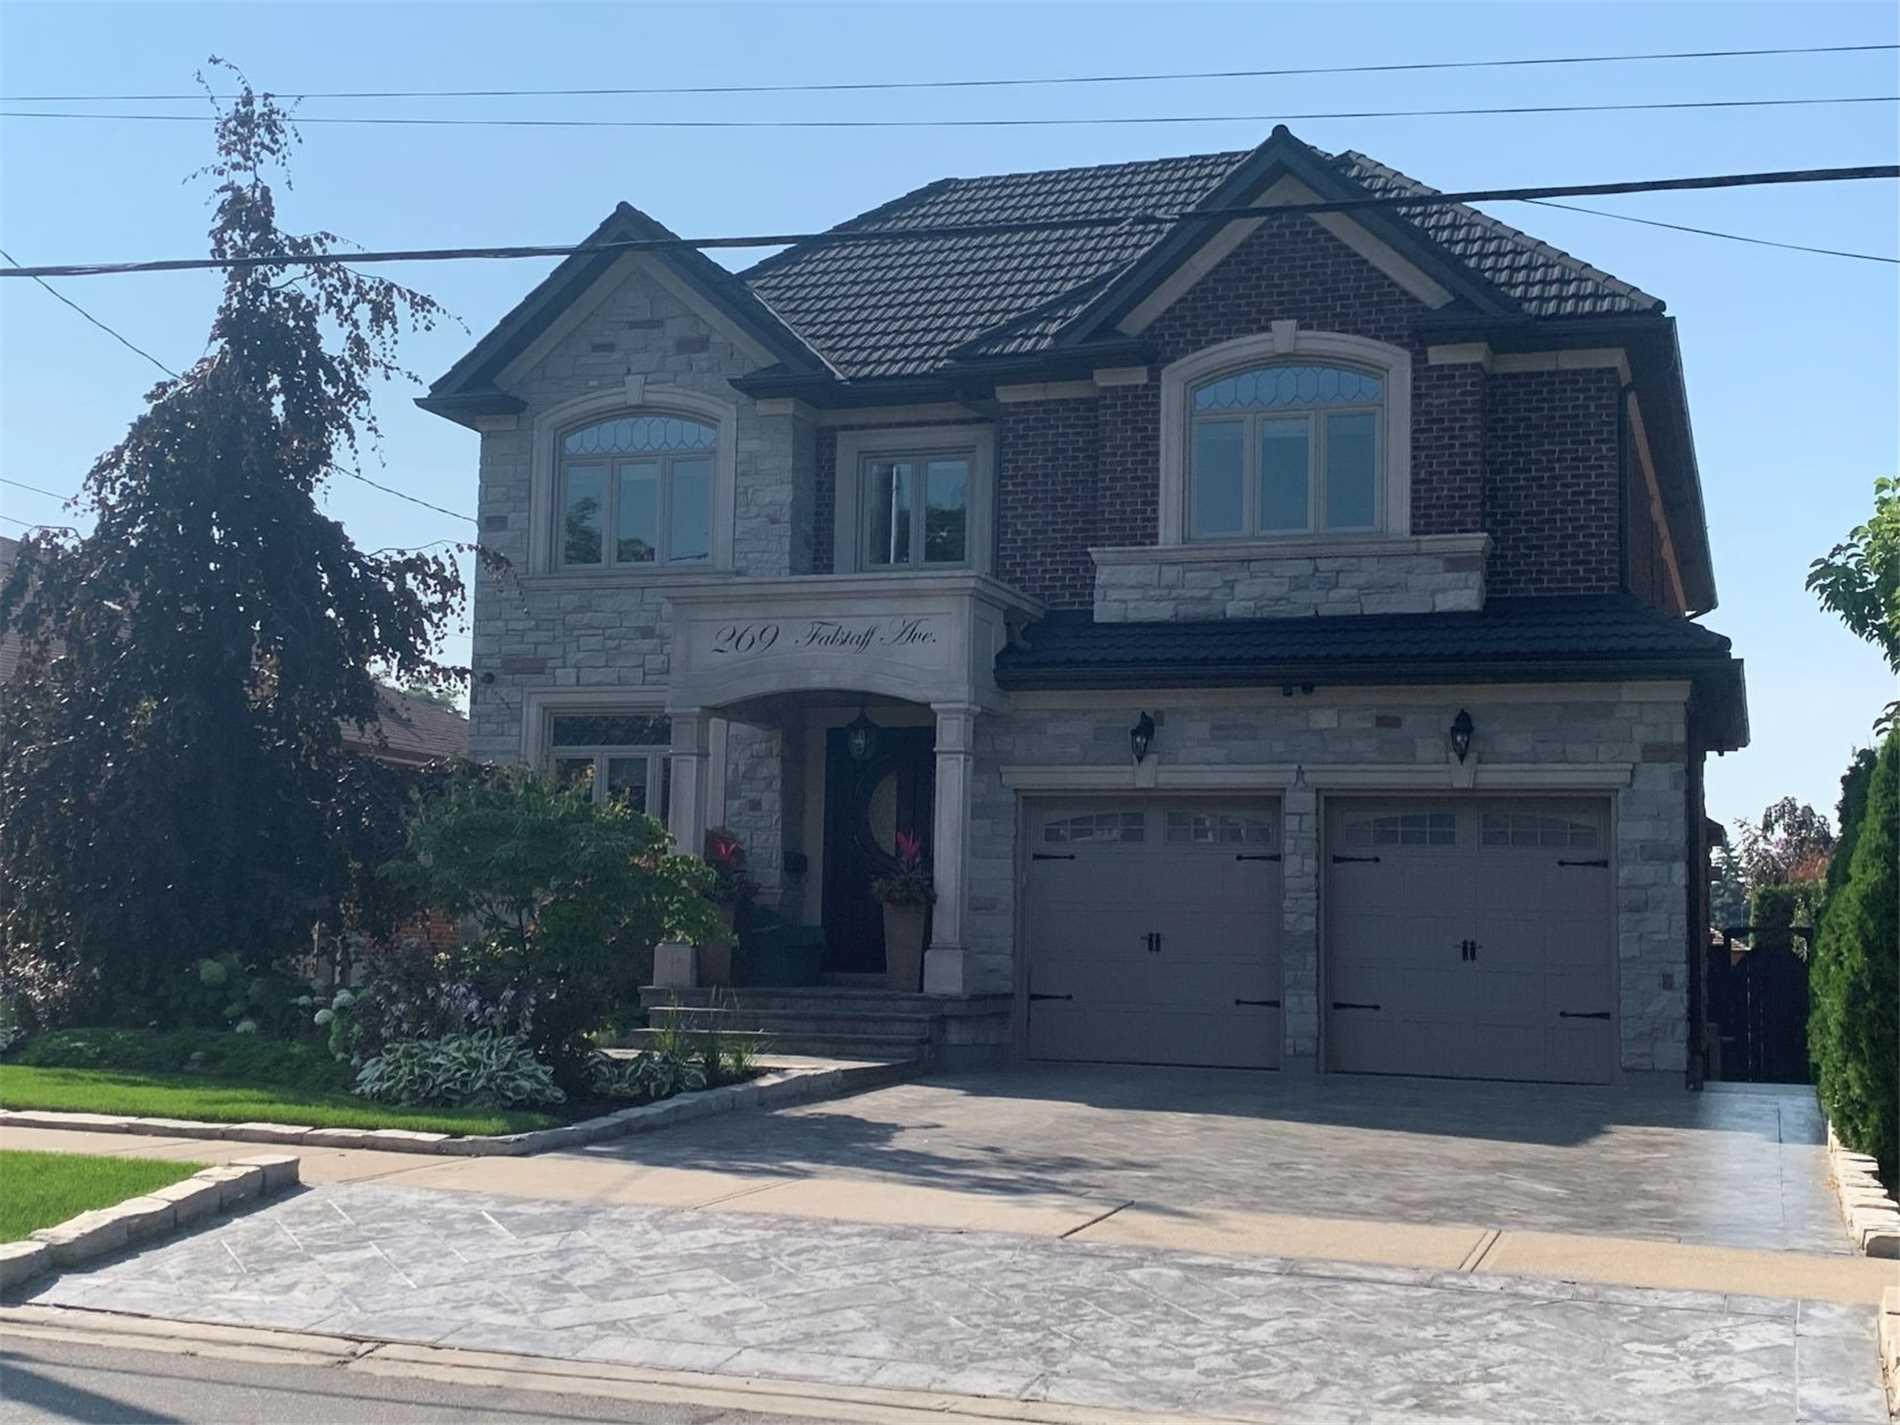 269 Falstaff Ave, Toronto, Ontario M6L 2G4, 4 Bedrooms Bedrooms, 10 Rooms Rooms,5 BathroomsBathrooms,Detached,For Sale,Falstaff,W5319843